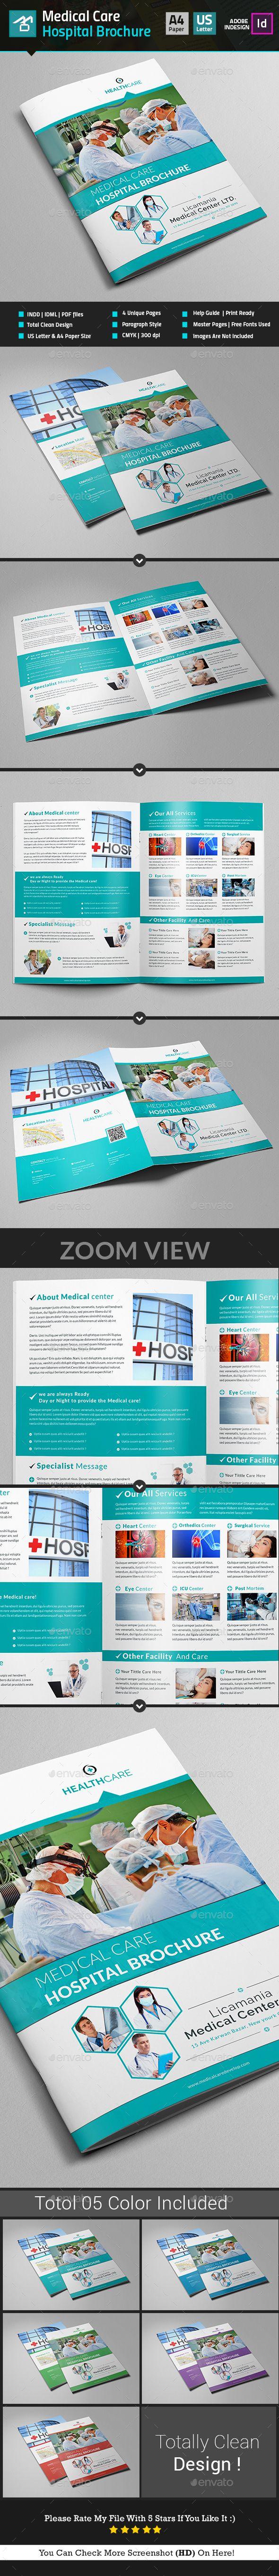 Medical Center  Hospital Brochure Template  Medical Center